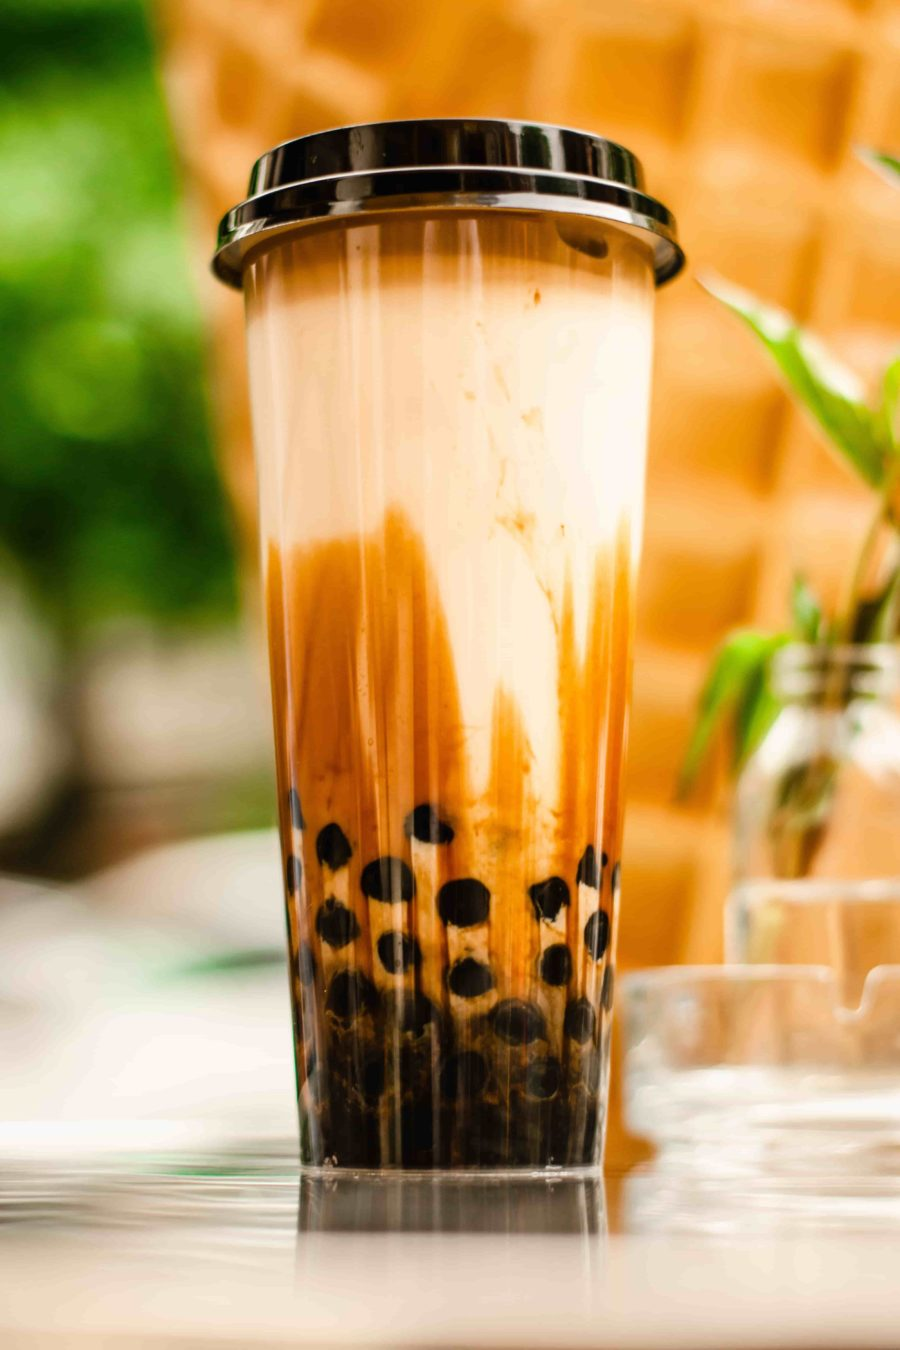 bubble tea/milk tea